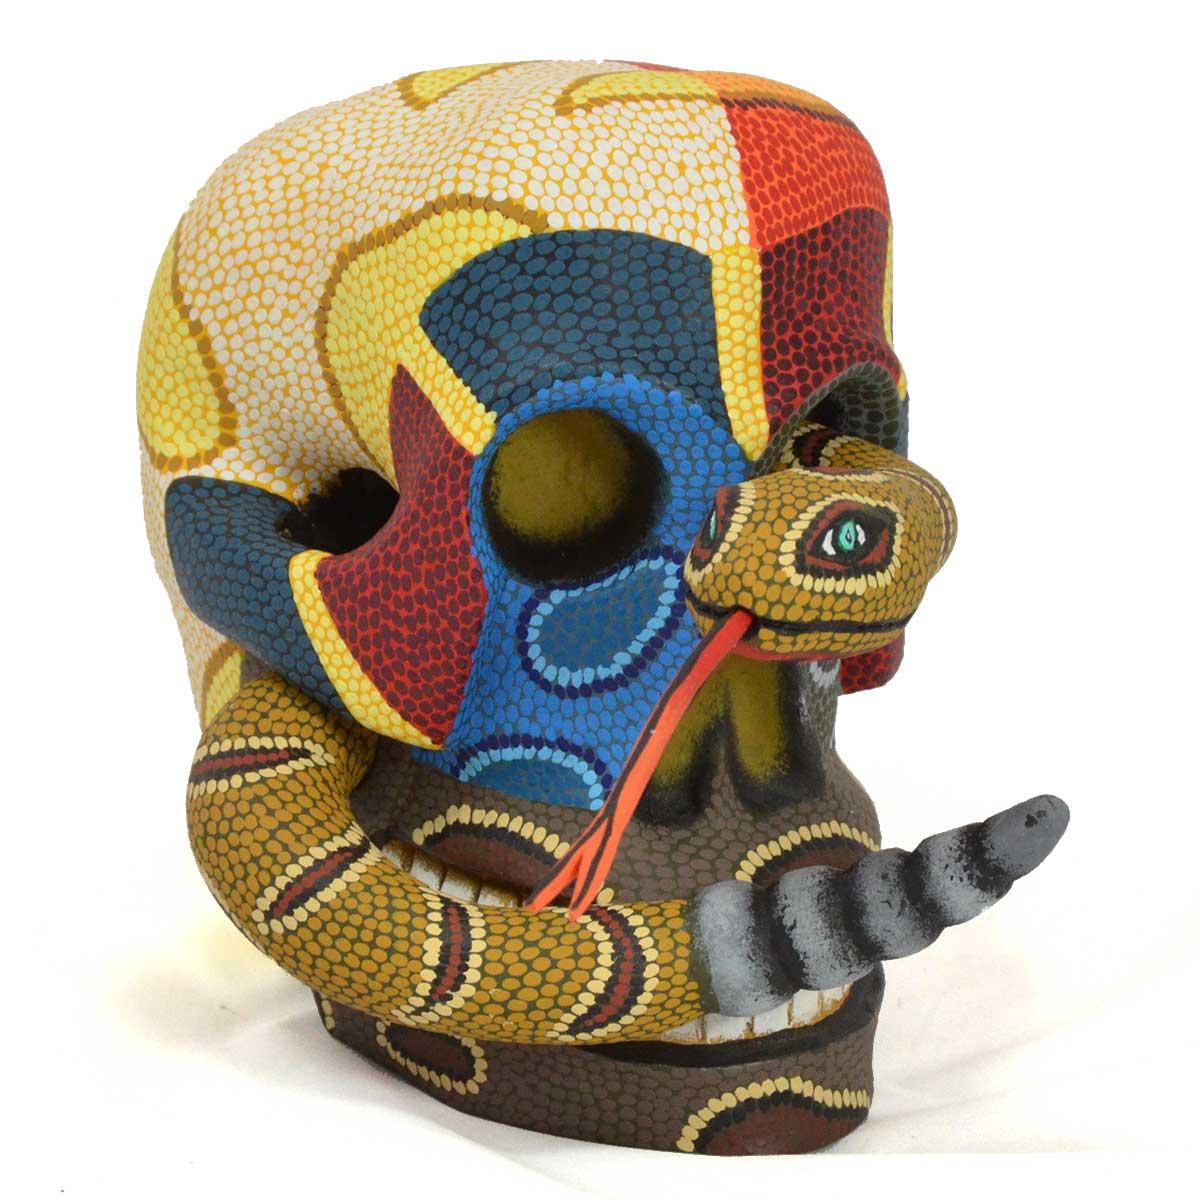 Eleazar Morales Eleazar Morales: Medium Human Skull with Rattlesnake Day of the Dead